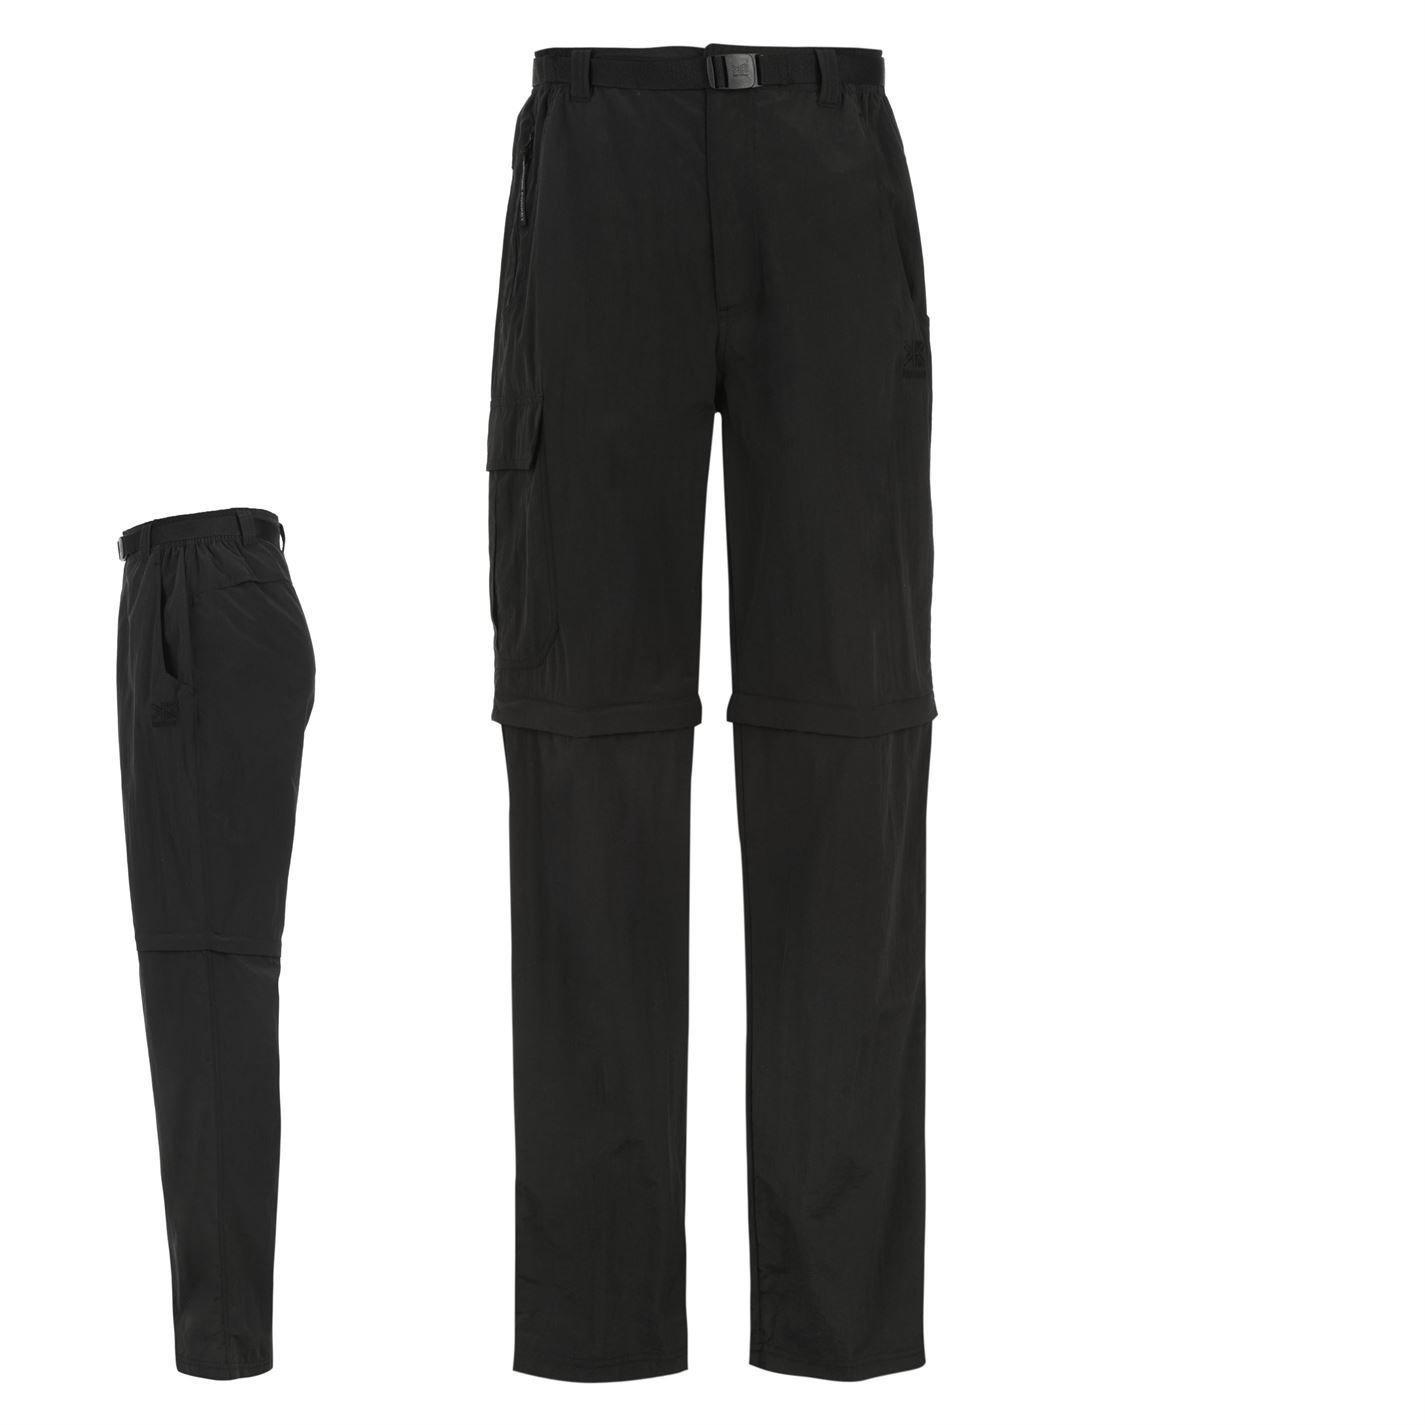 Karrimor Kids Aspen Convertible Hiking Walking Trousers Pants Junior